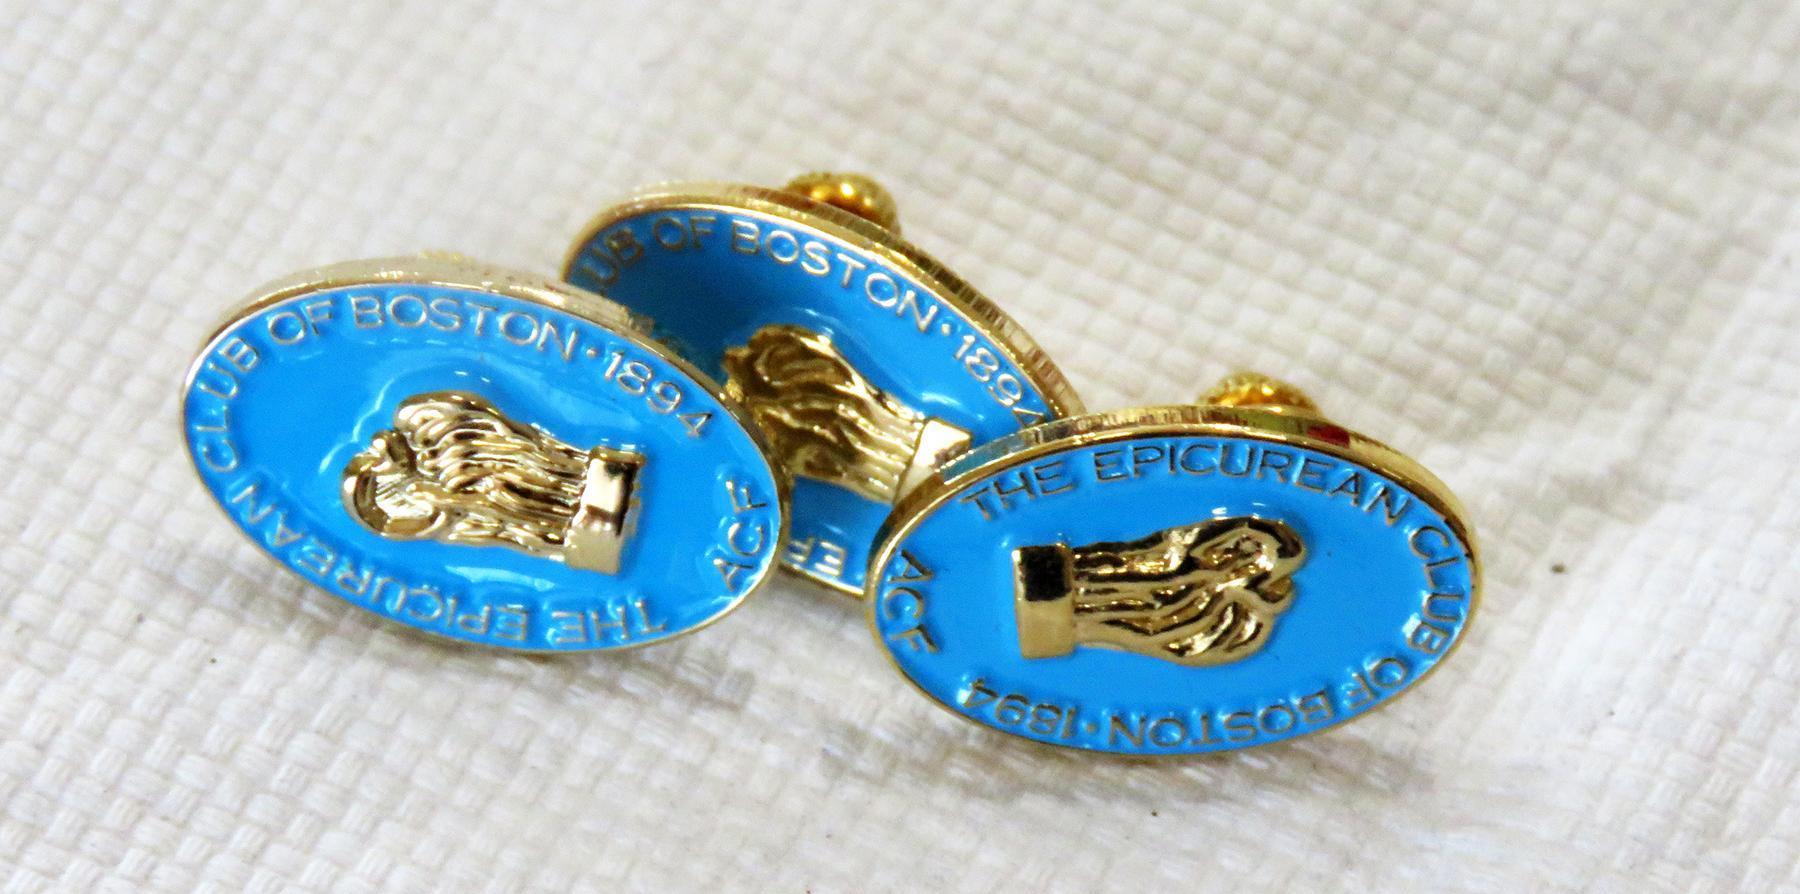 Closeups of three Epicurean Club of Boston pins